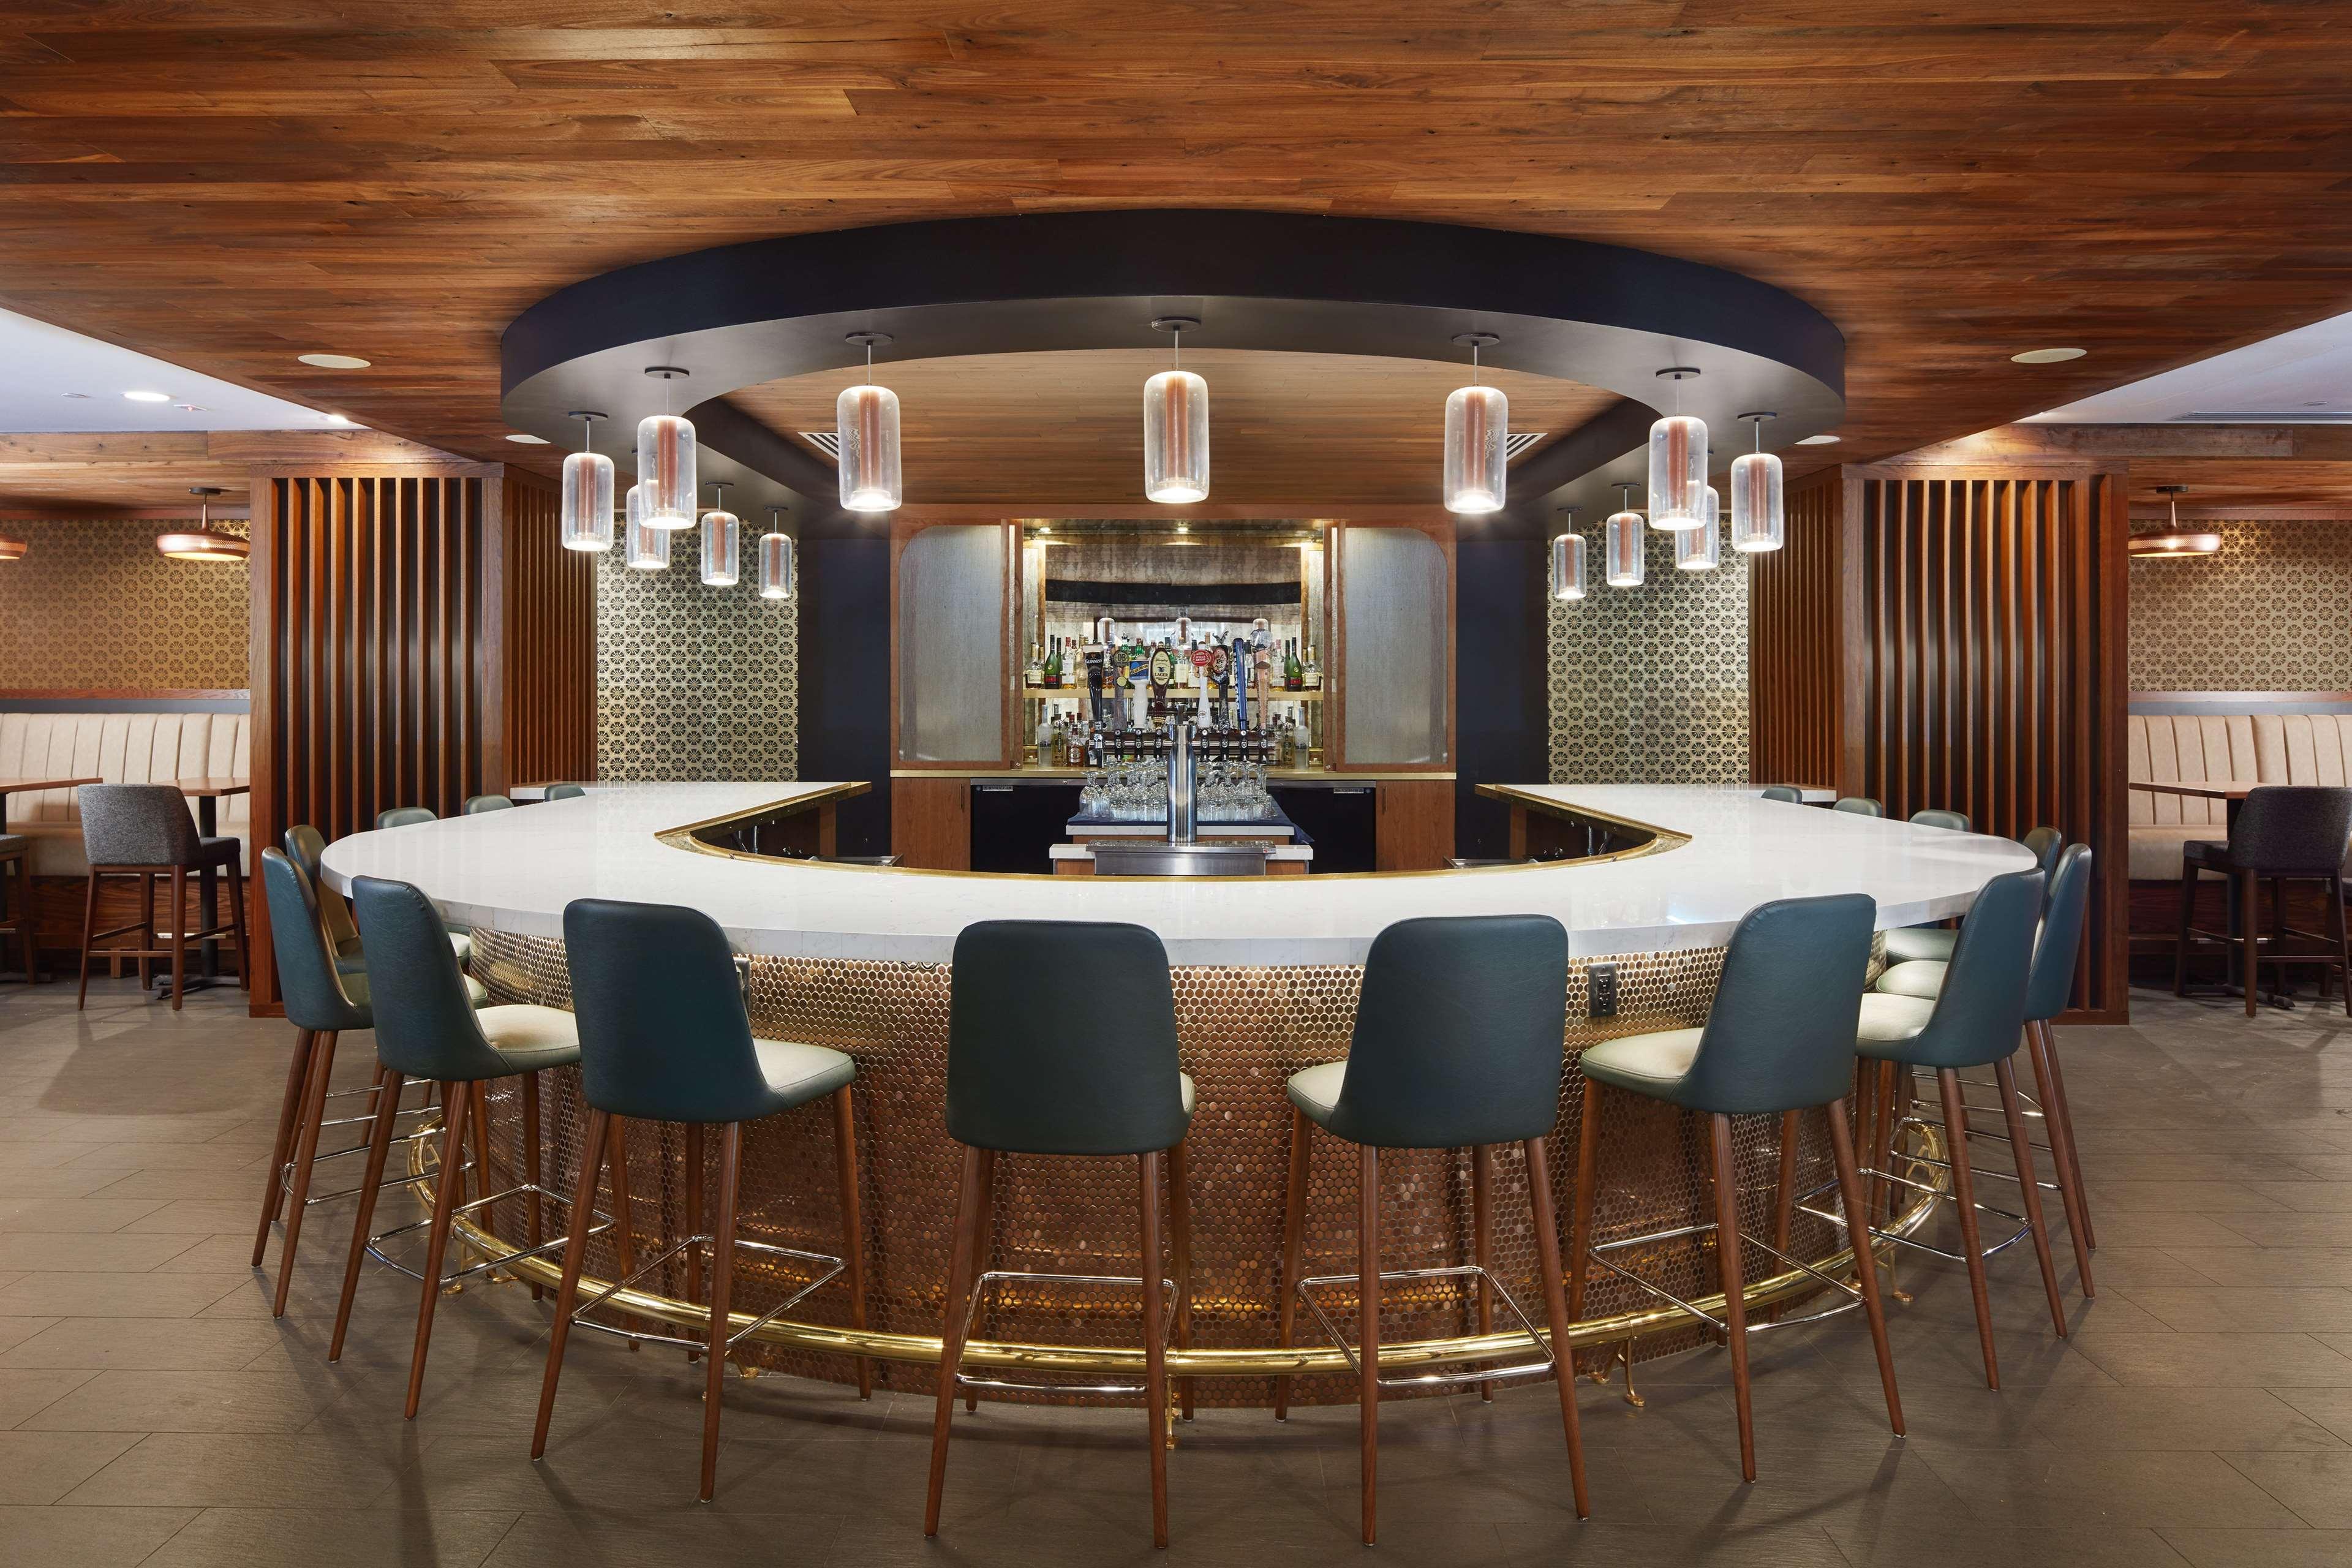 washington hilton washington dc dc. Black Bedroom Furniture Sets. Home Design Ideas